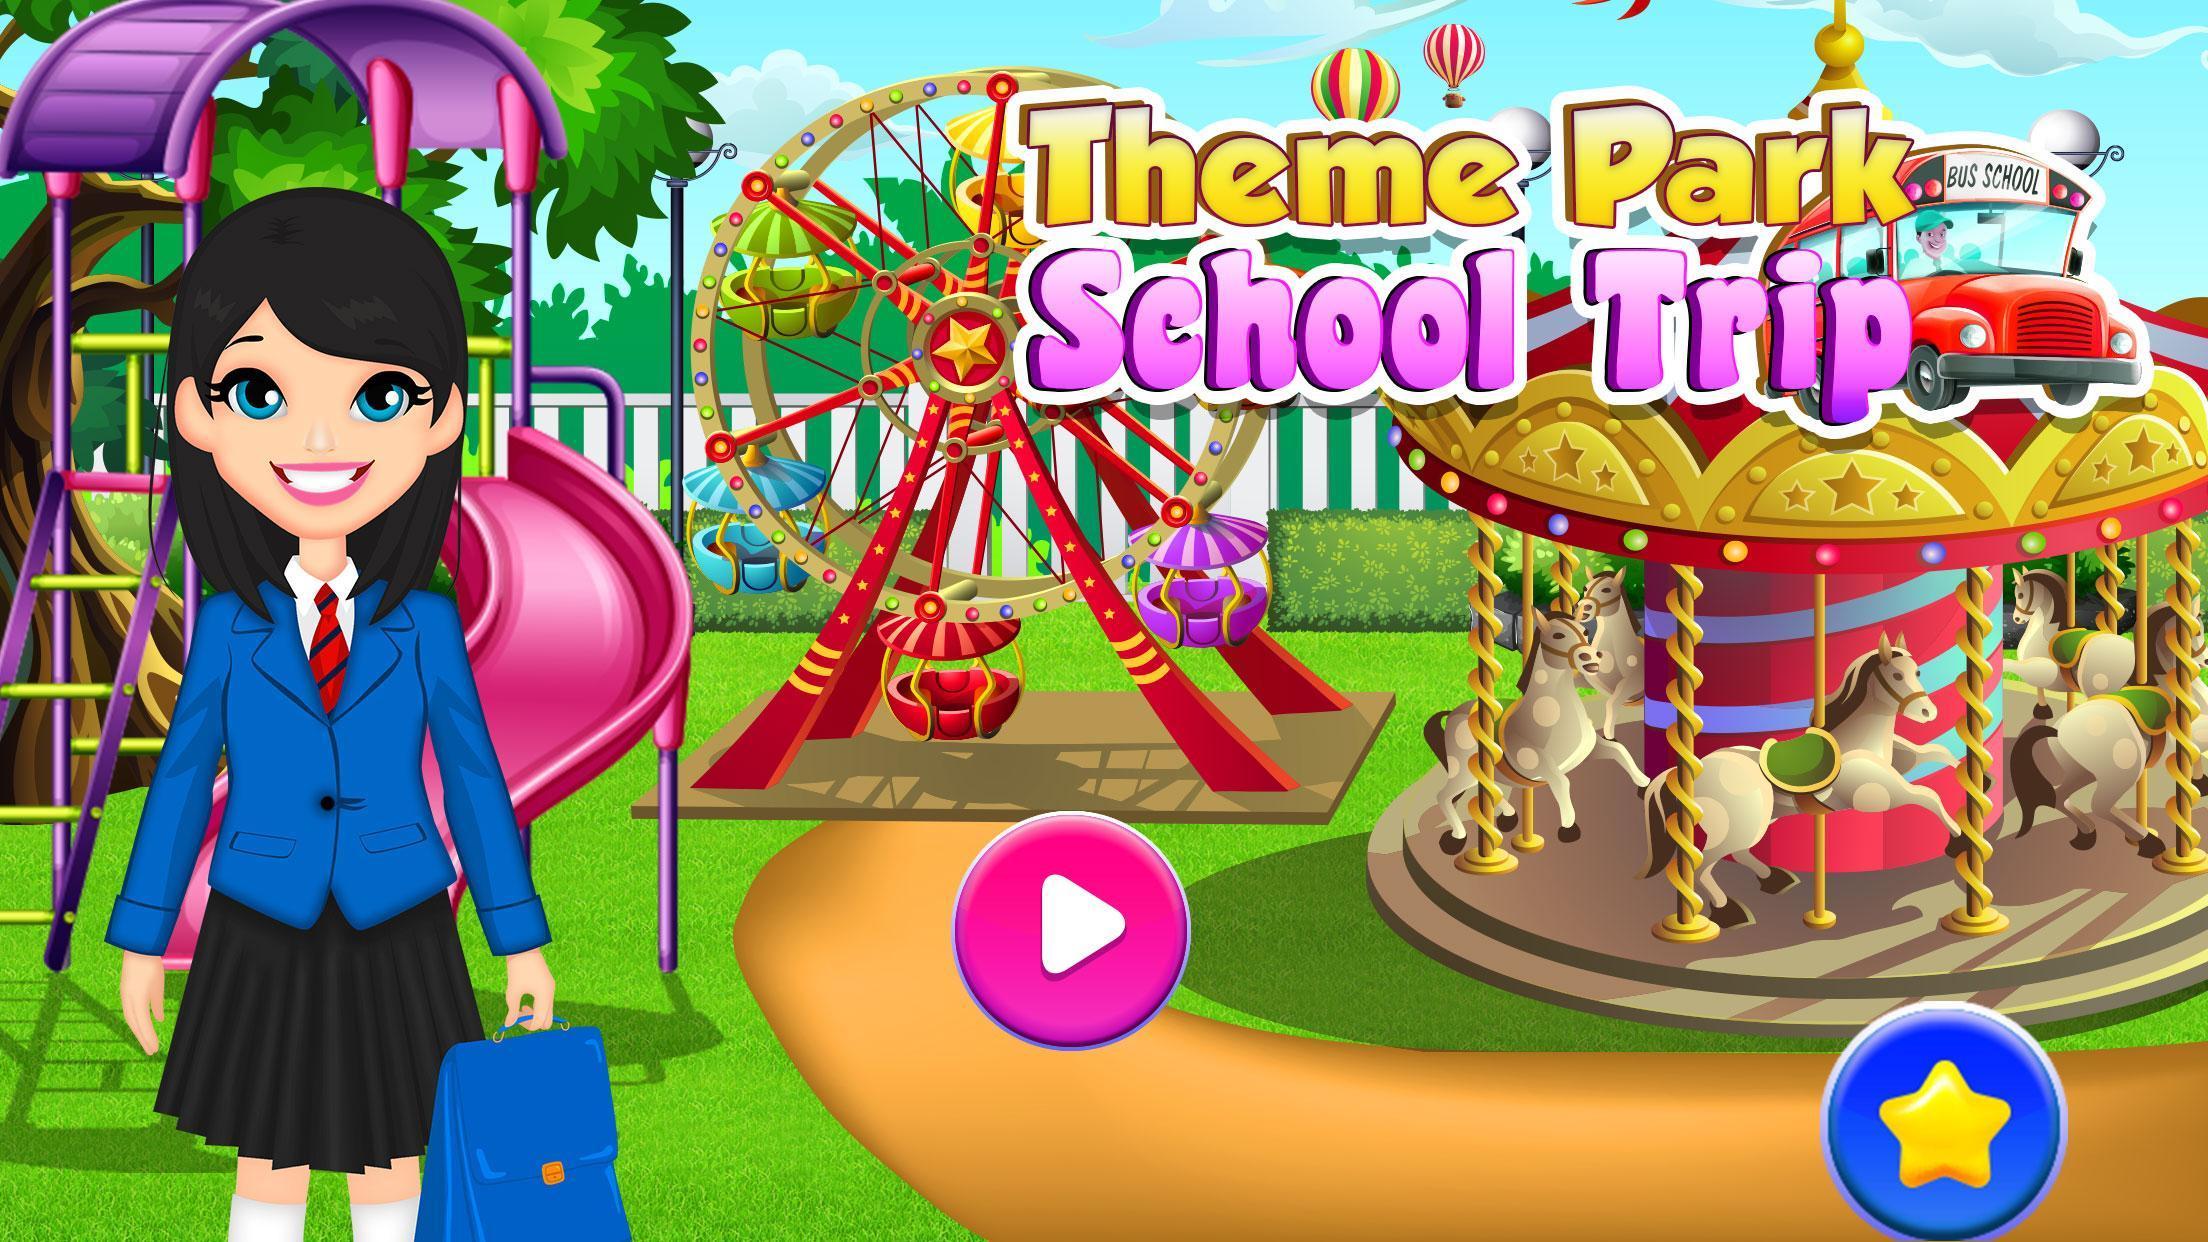 Theme Park School Trip Summer Picnic Adventure 1.0.5 Screenshot 1